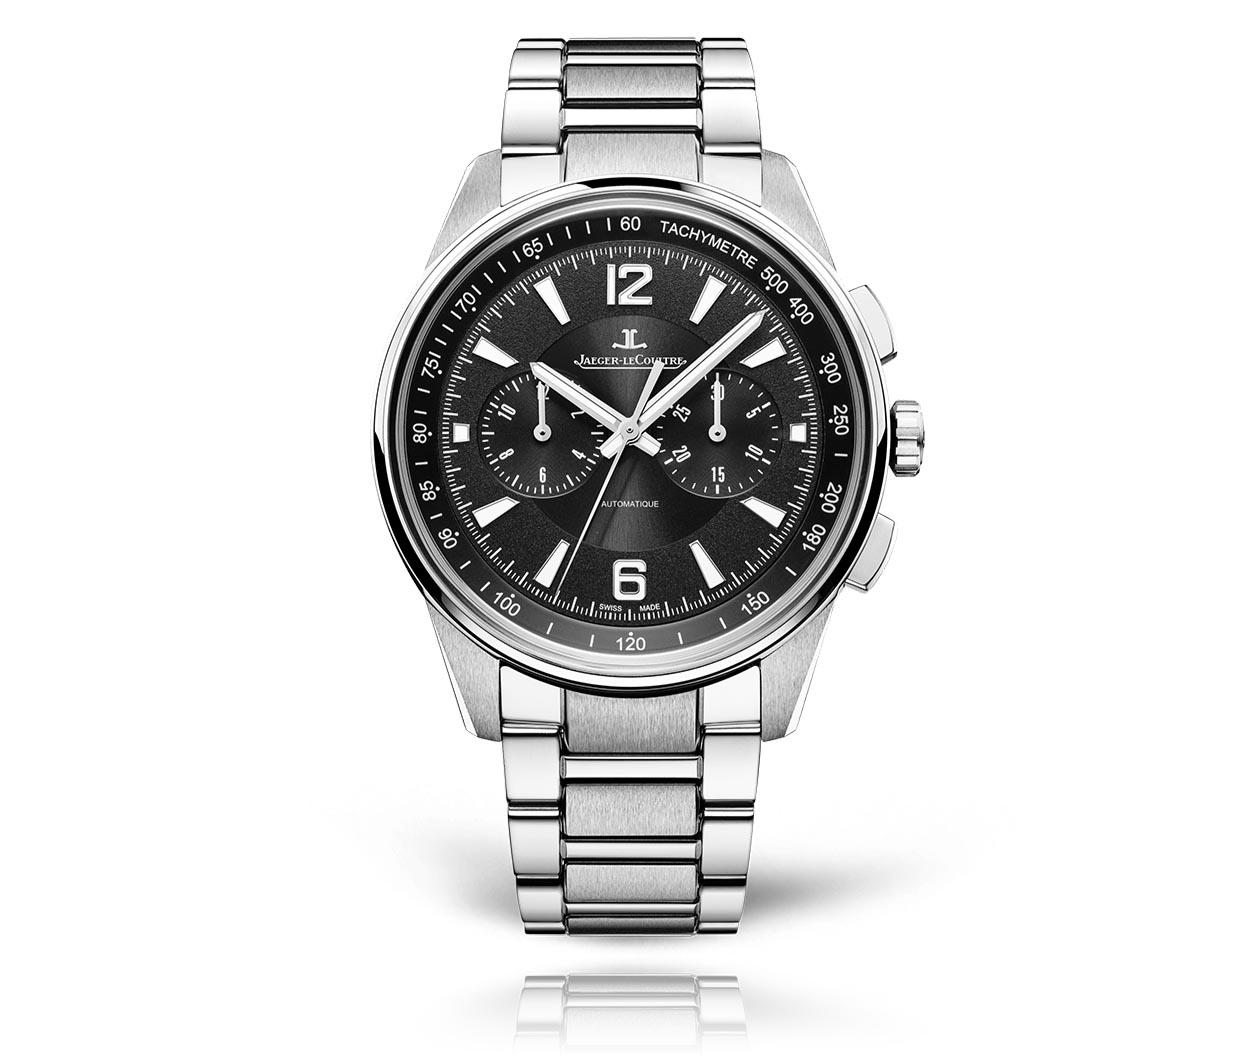 JaegerLeCoultre Polaris Chronograph 9028170 Flatlay FINAL